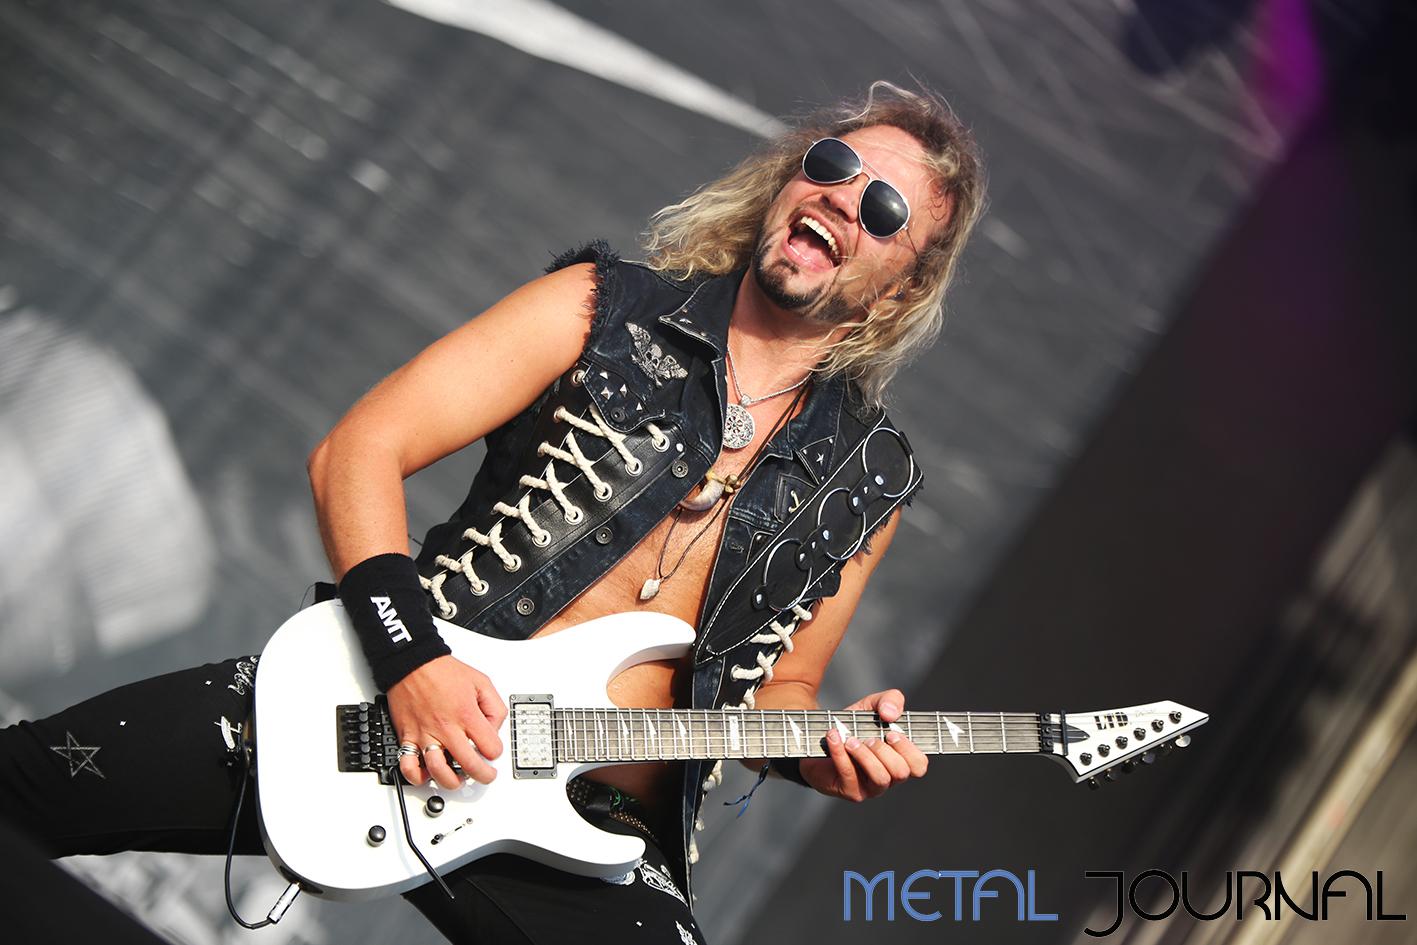 udo - metal journal rock fest barcelona 2019 pic 8